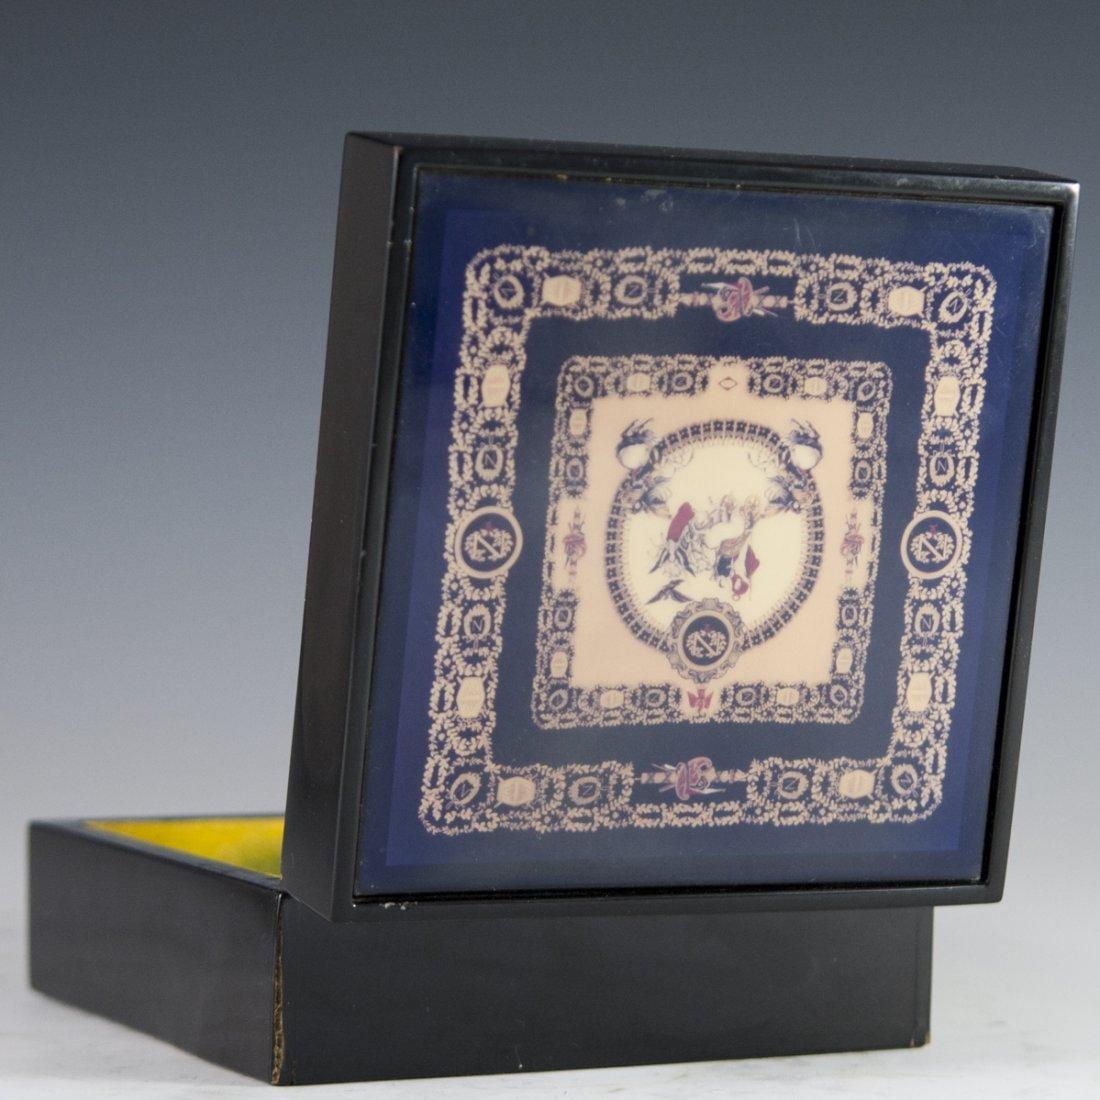 Vintage Gianni Versace Jewelry Box